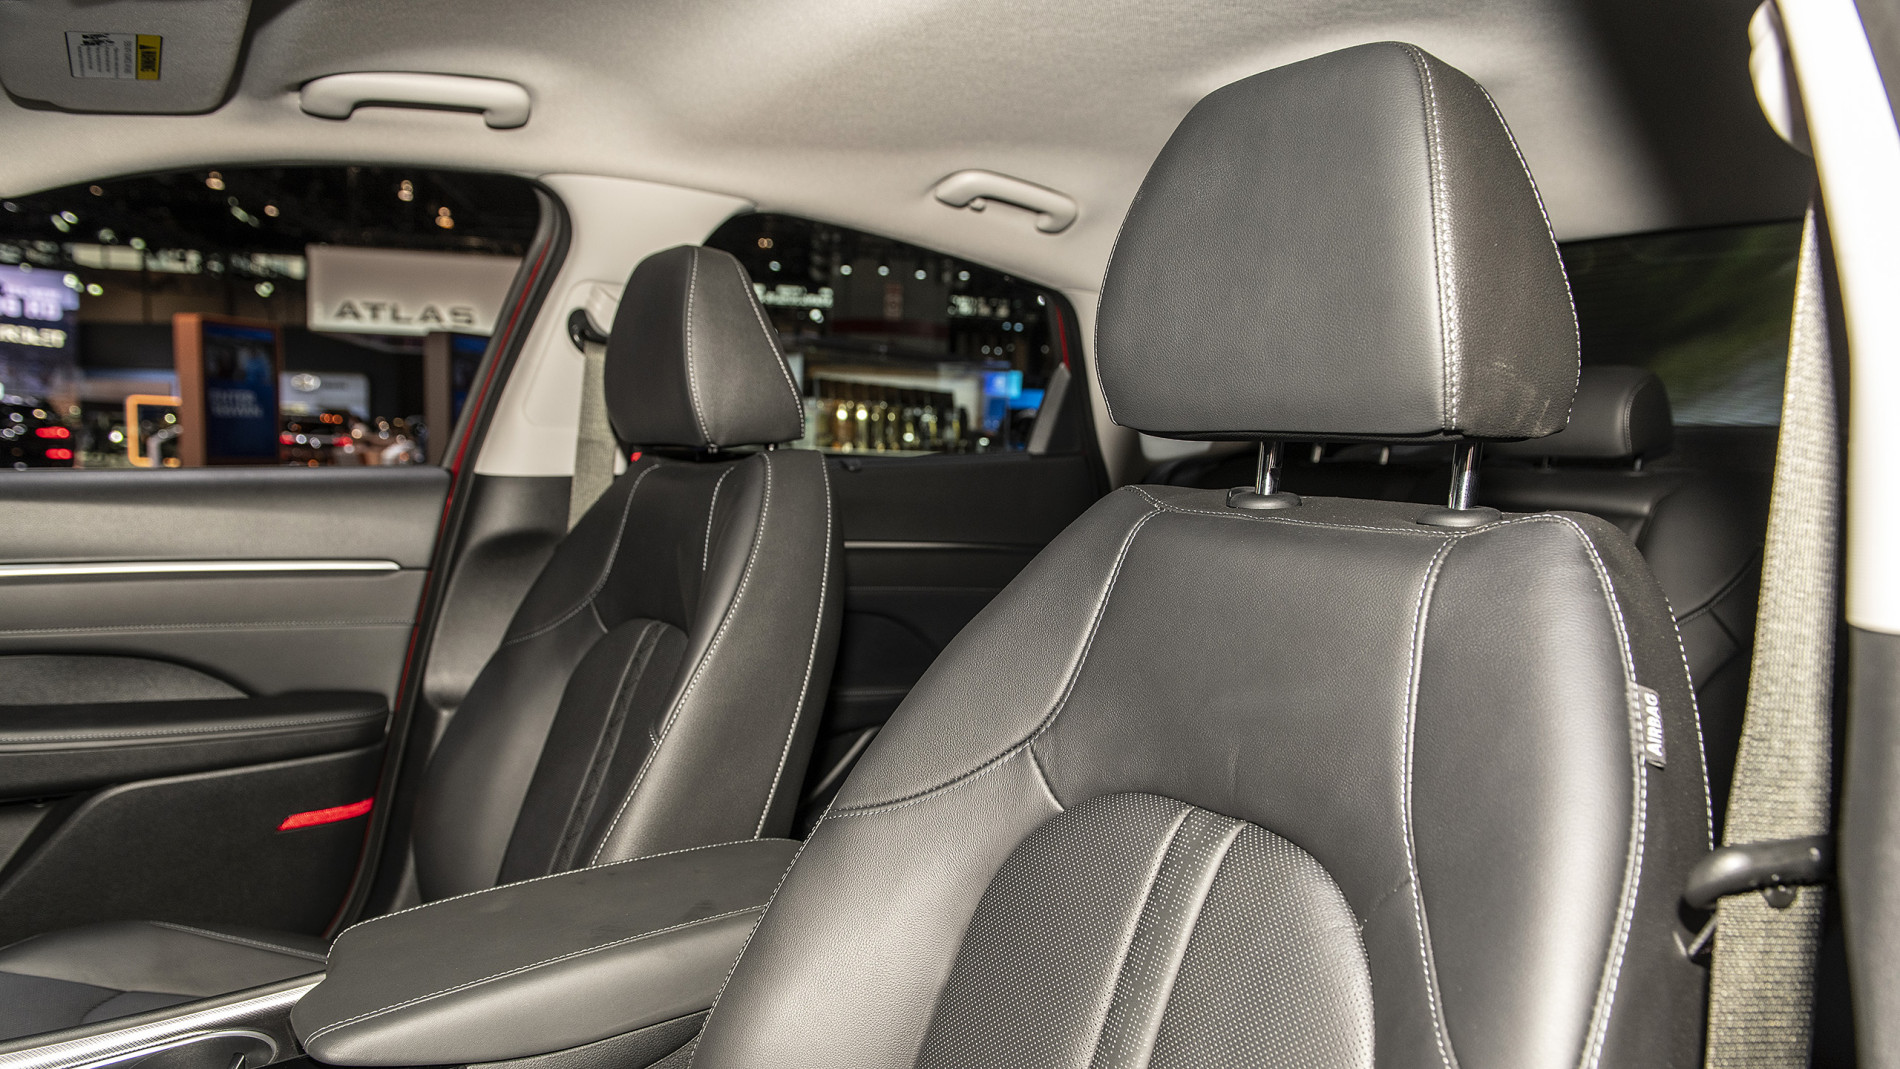 Hyundai Sonata Hybrid - Poze Reale - Hyundai Sonata Hybrid - Poze Reale